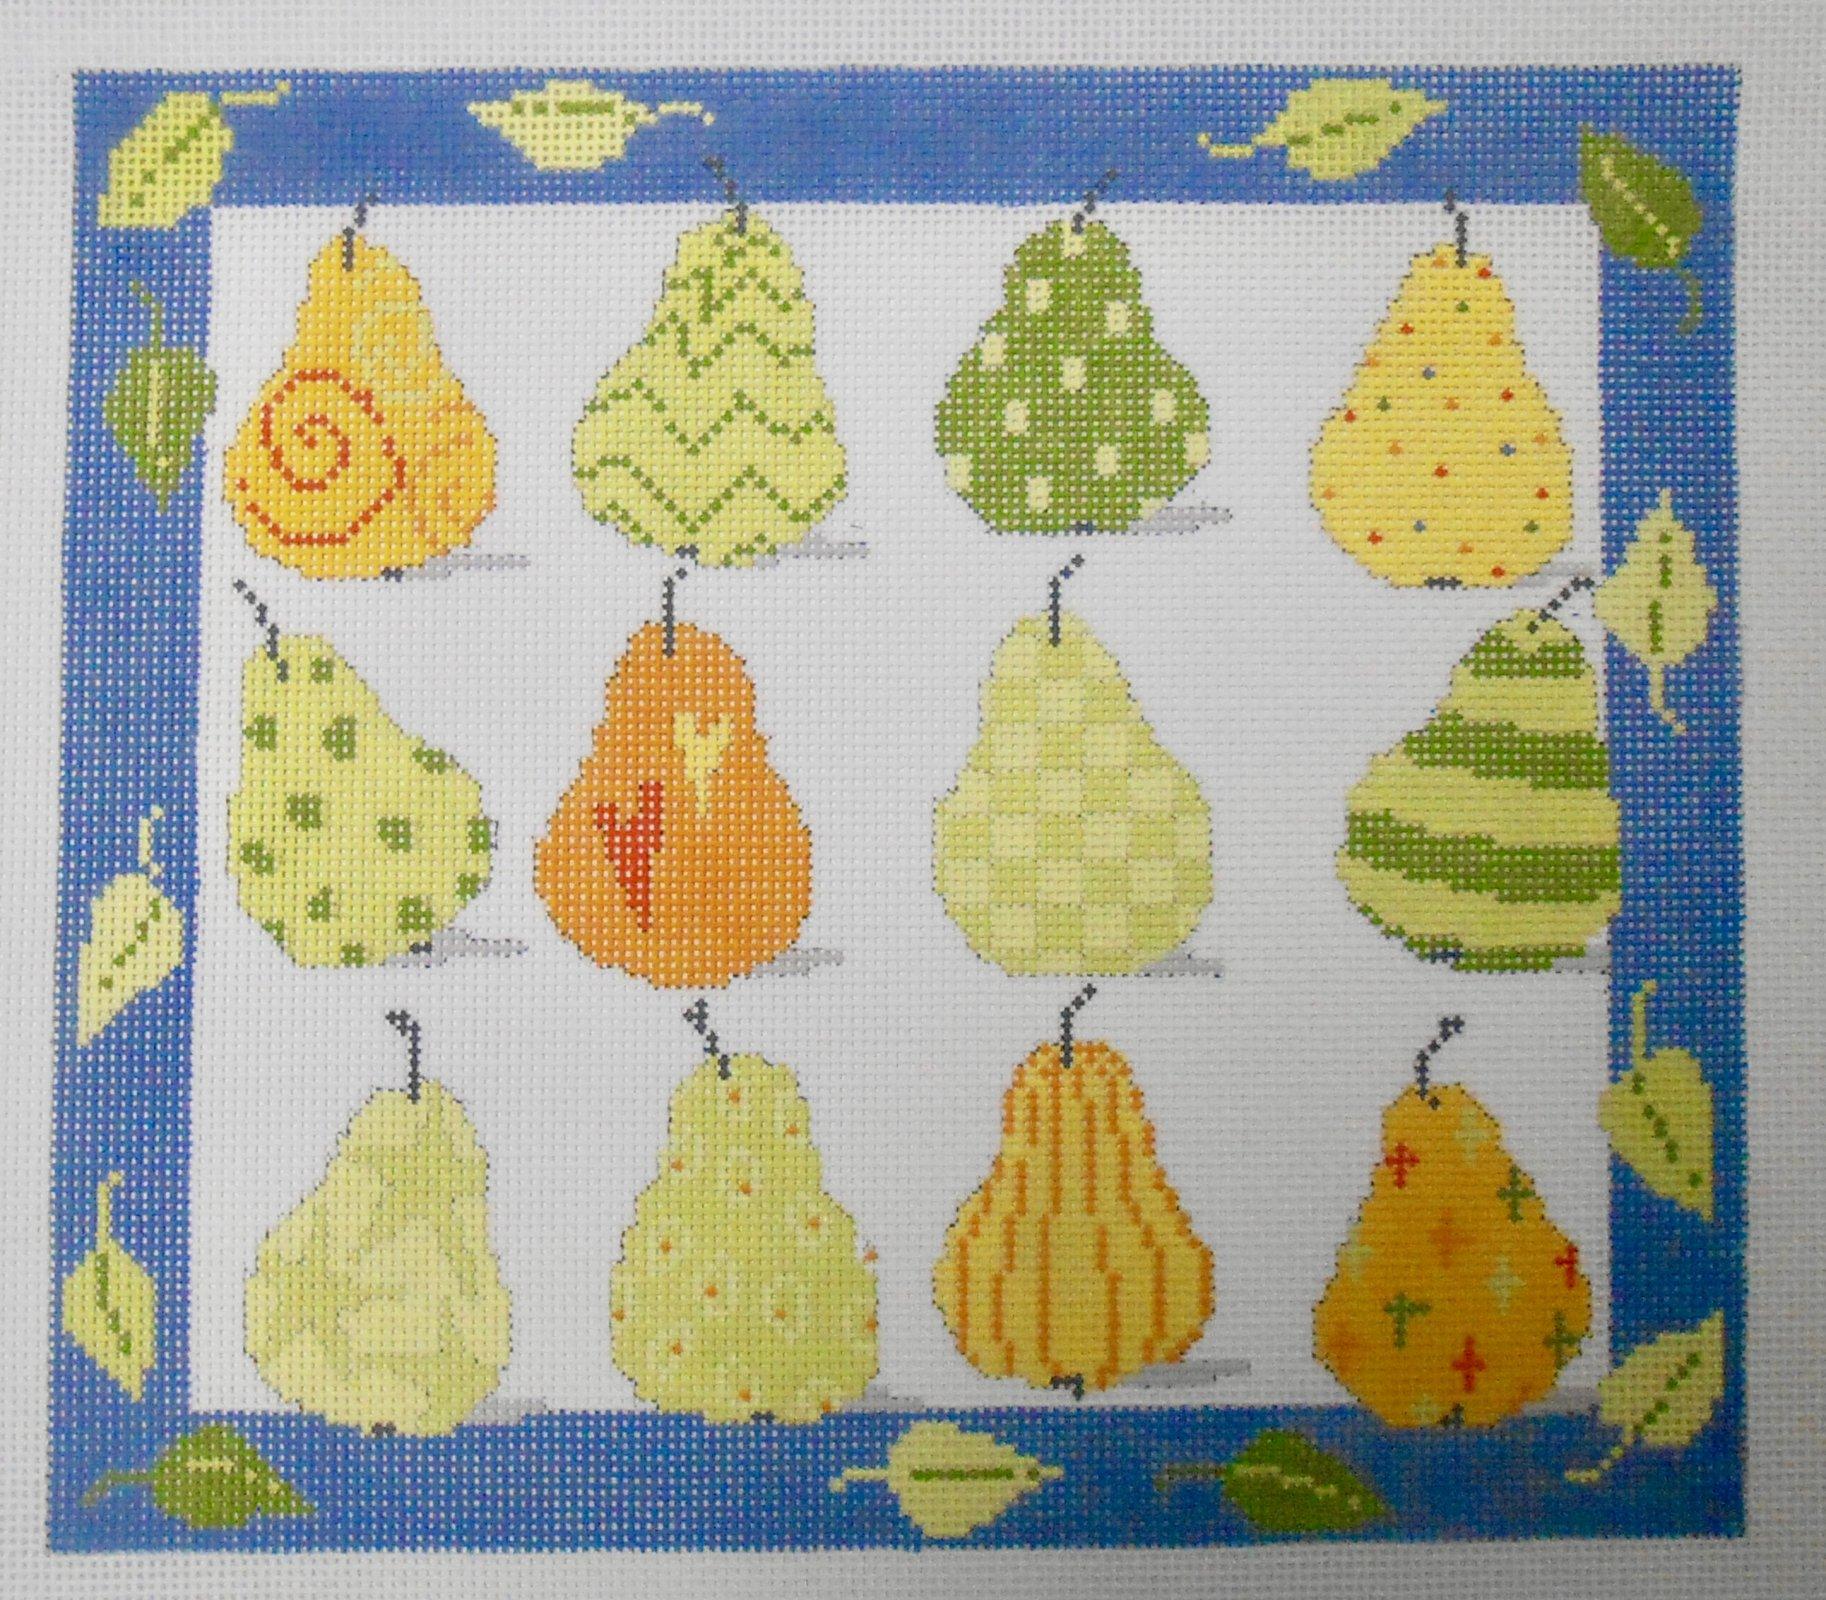 12 Pears